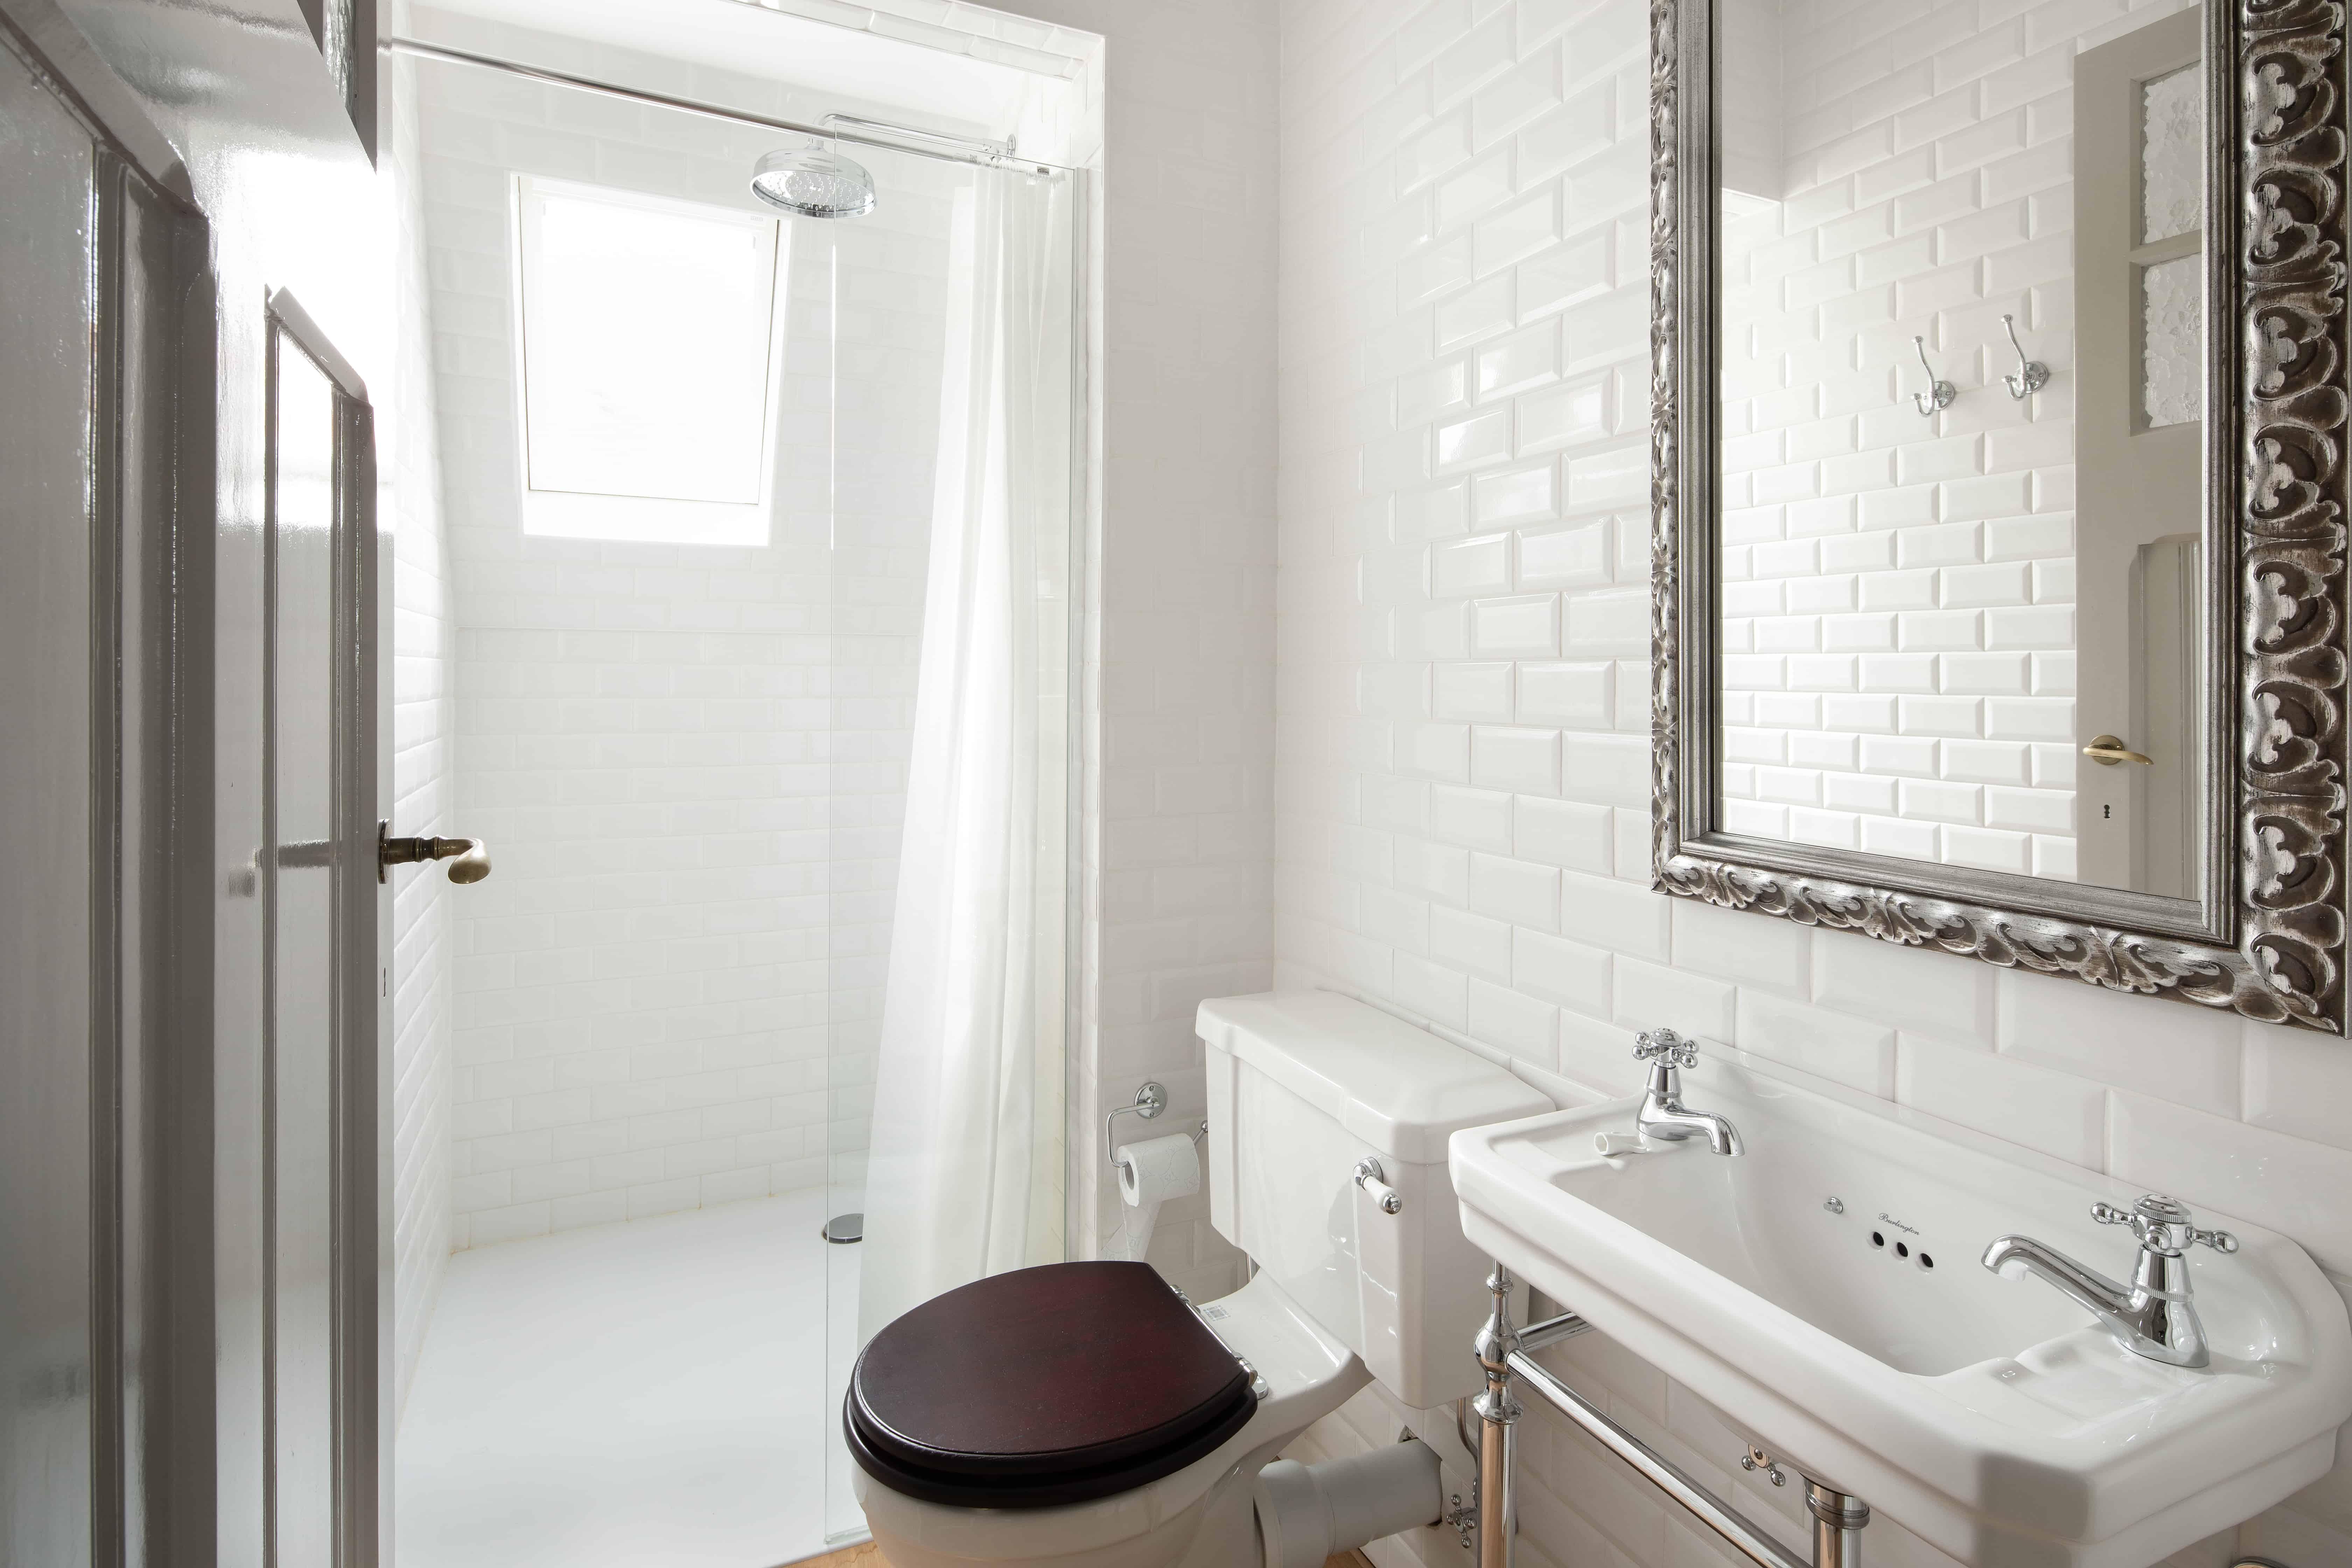 Badkamer met glimmende witte kleine tegel aan de muur - kleine wandtegels